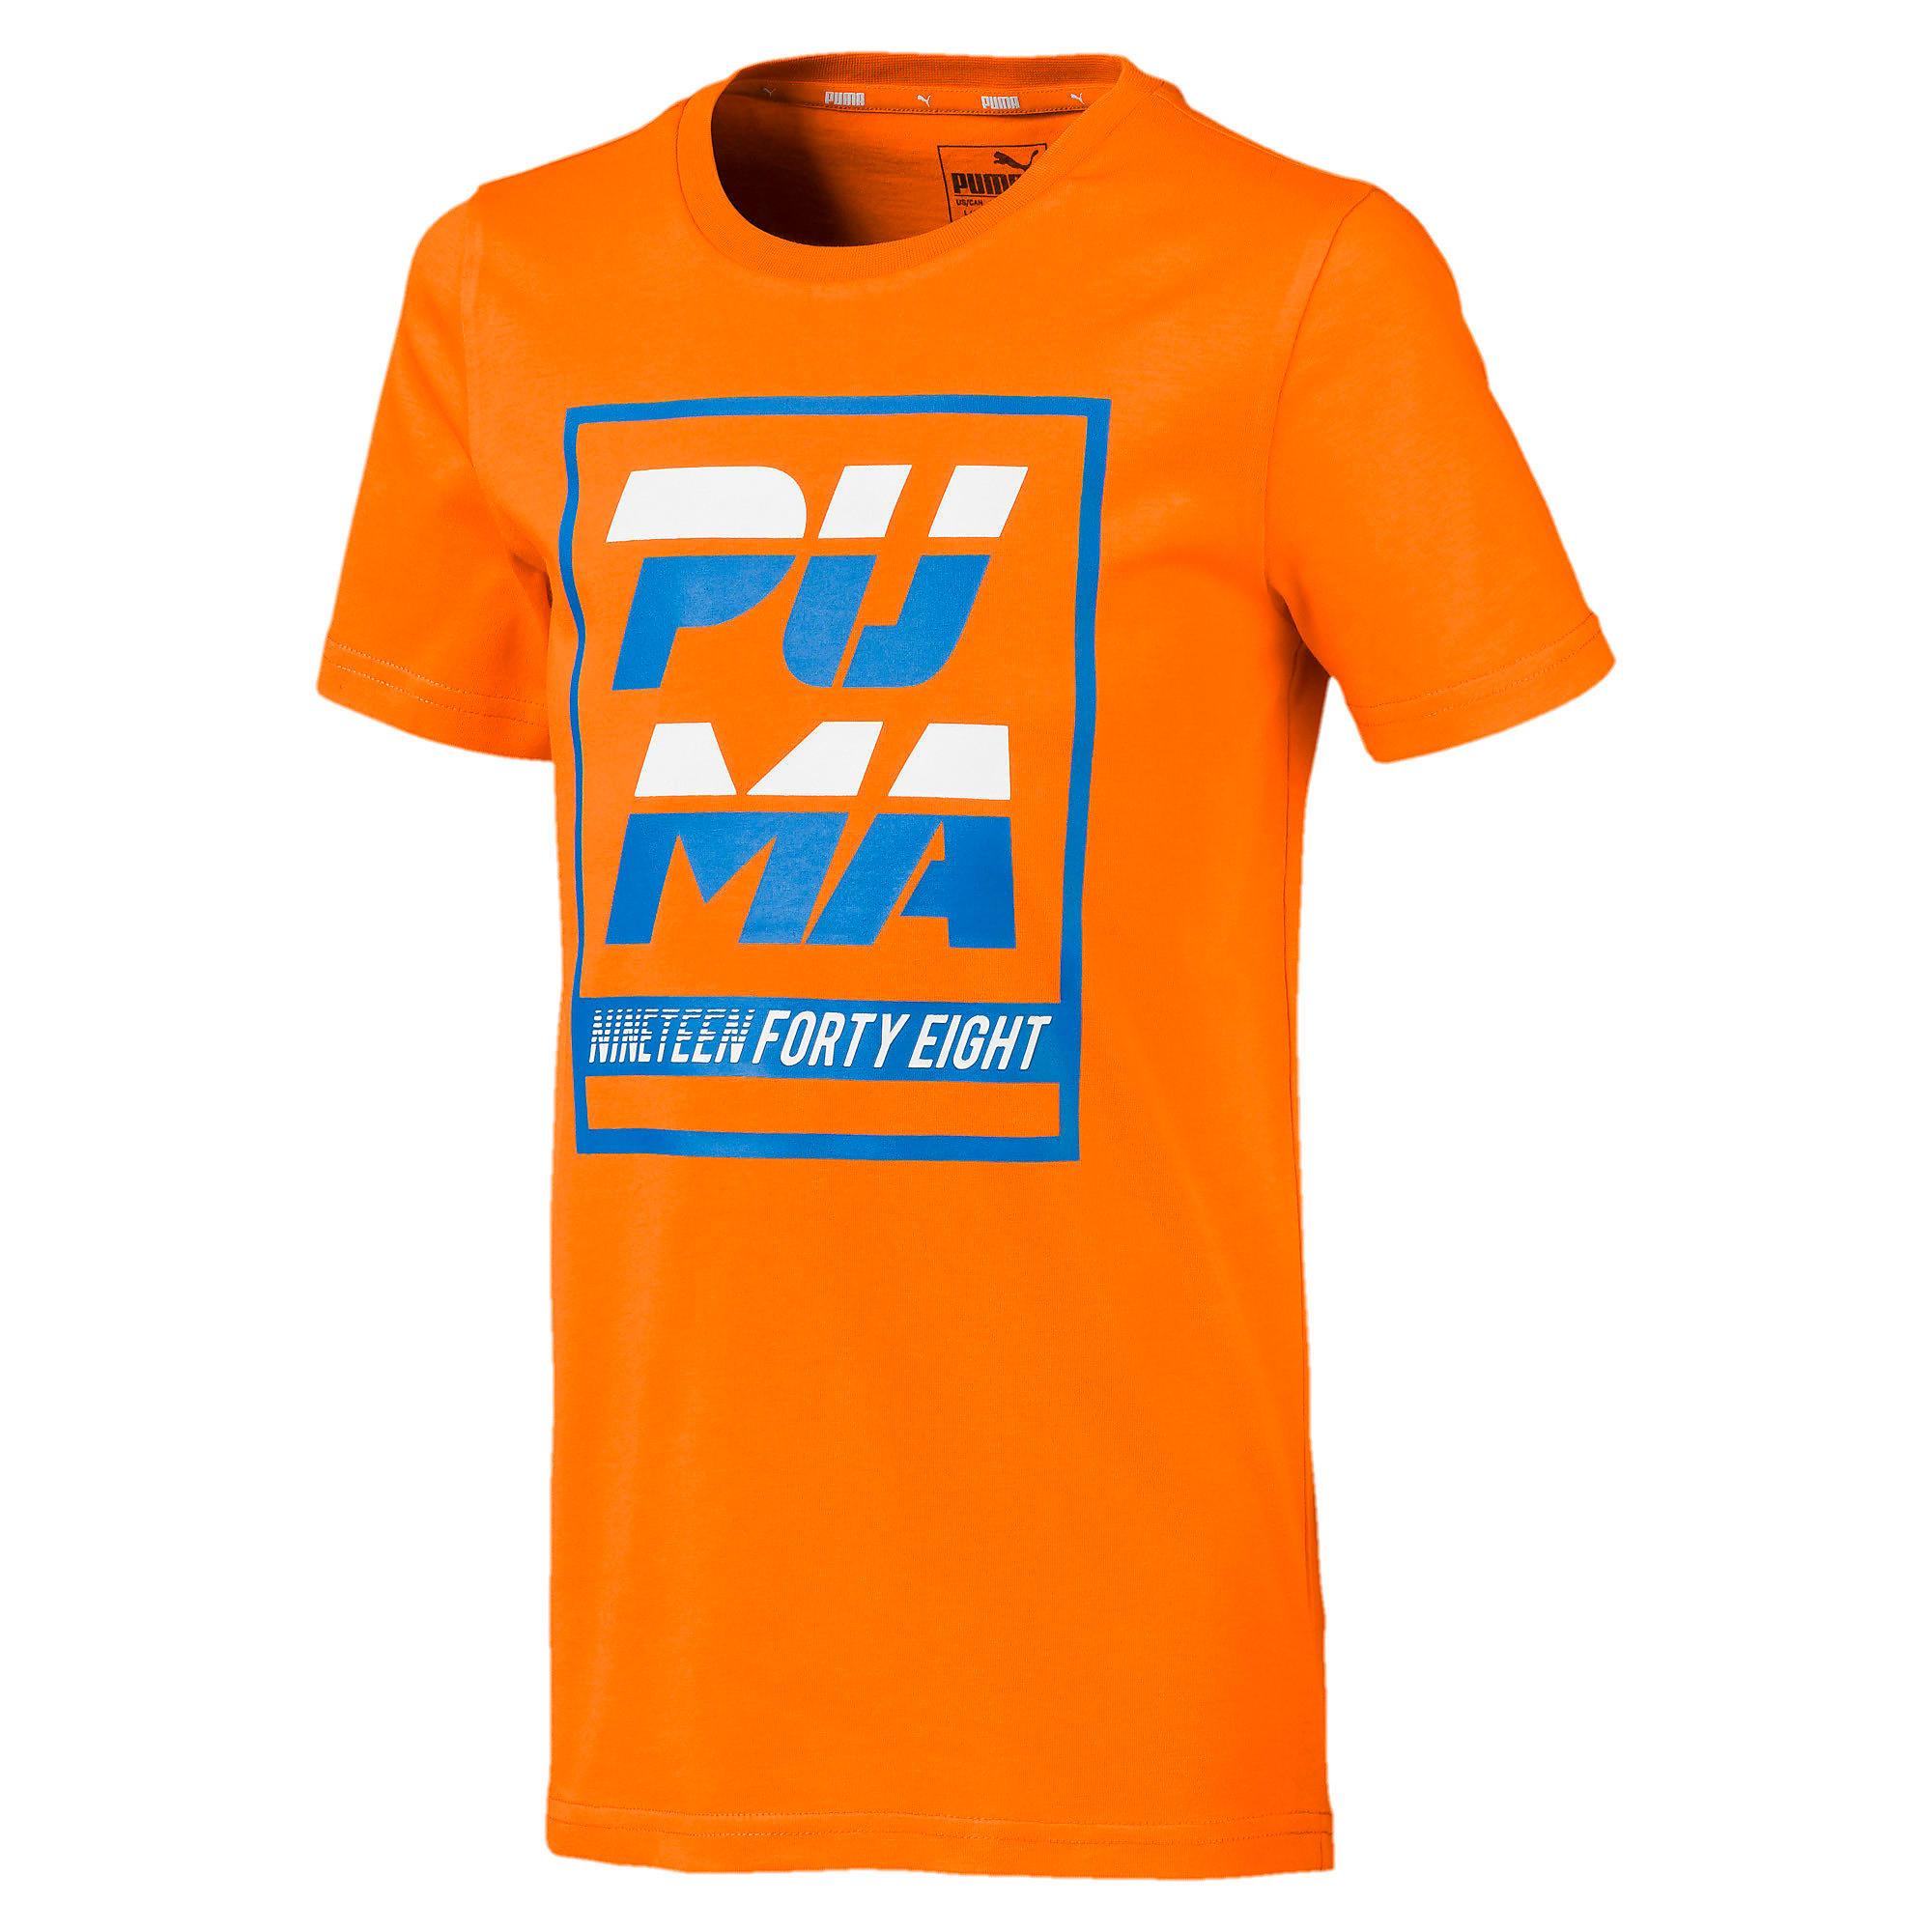 Thumbnail 1 of キッズ ALPHA SS グラフィック Tシャツ 半袖, Orange Popsicle, medium-JPN